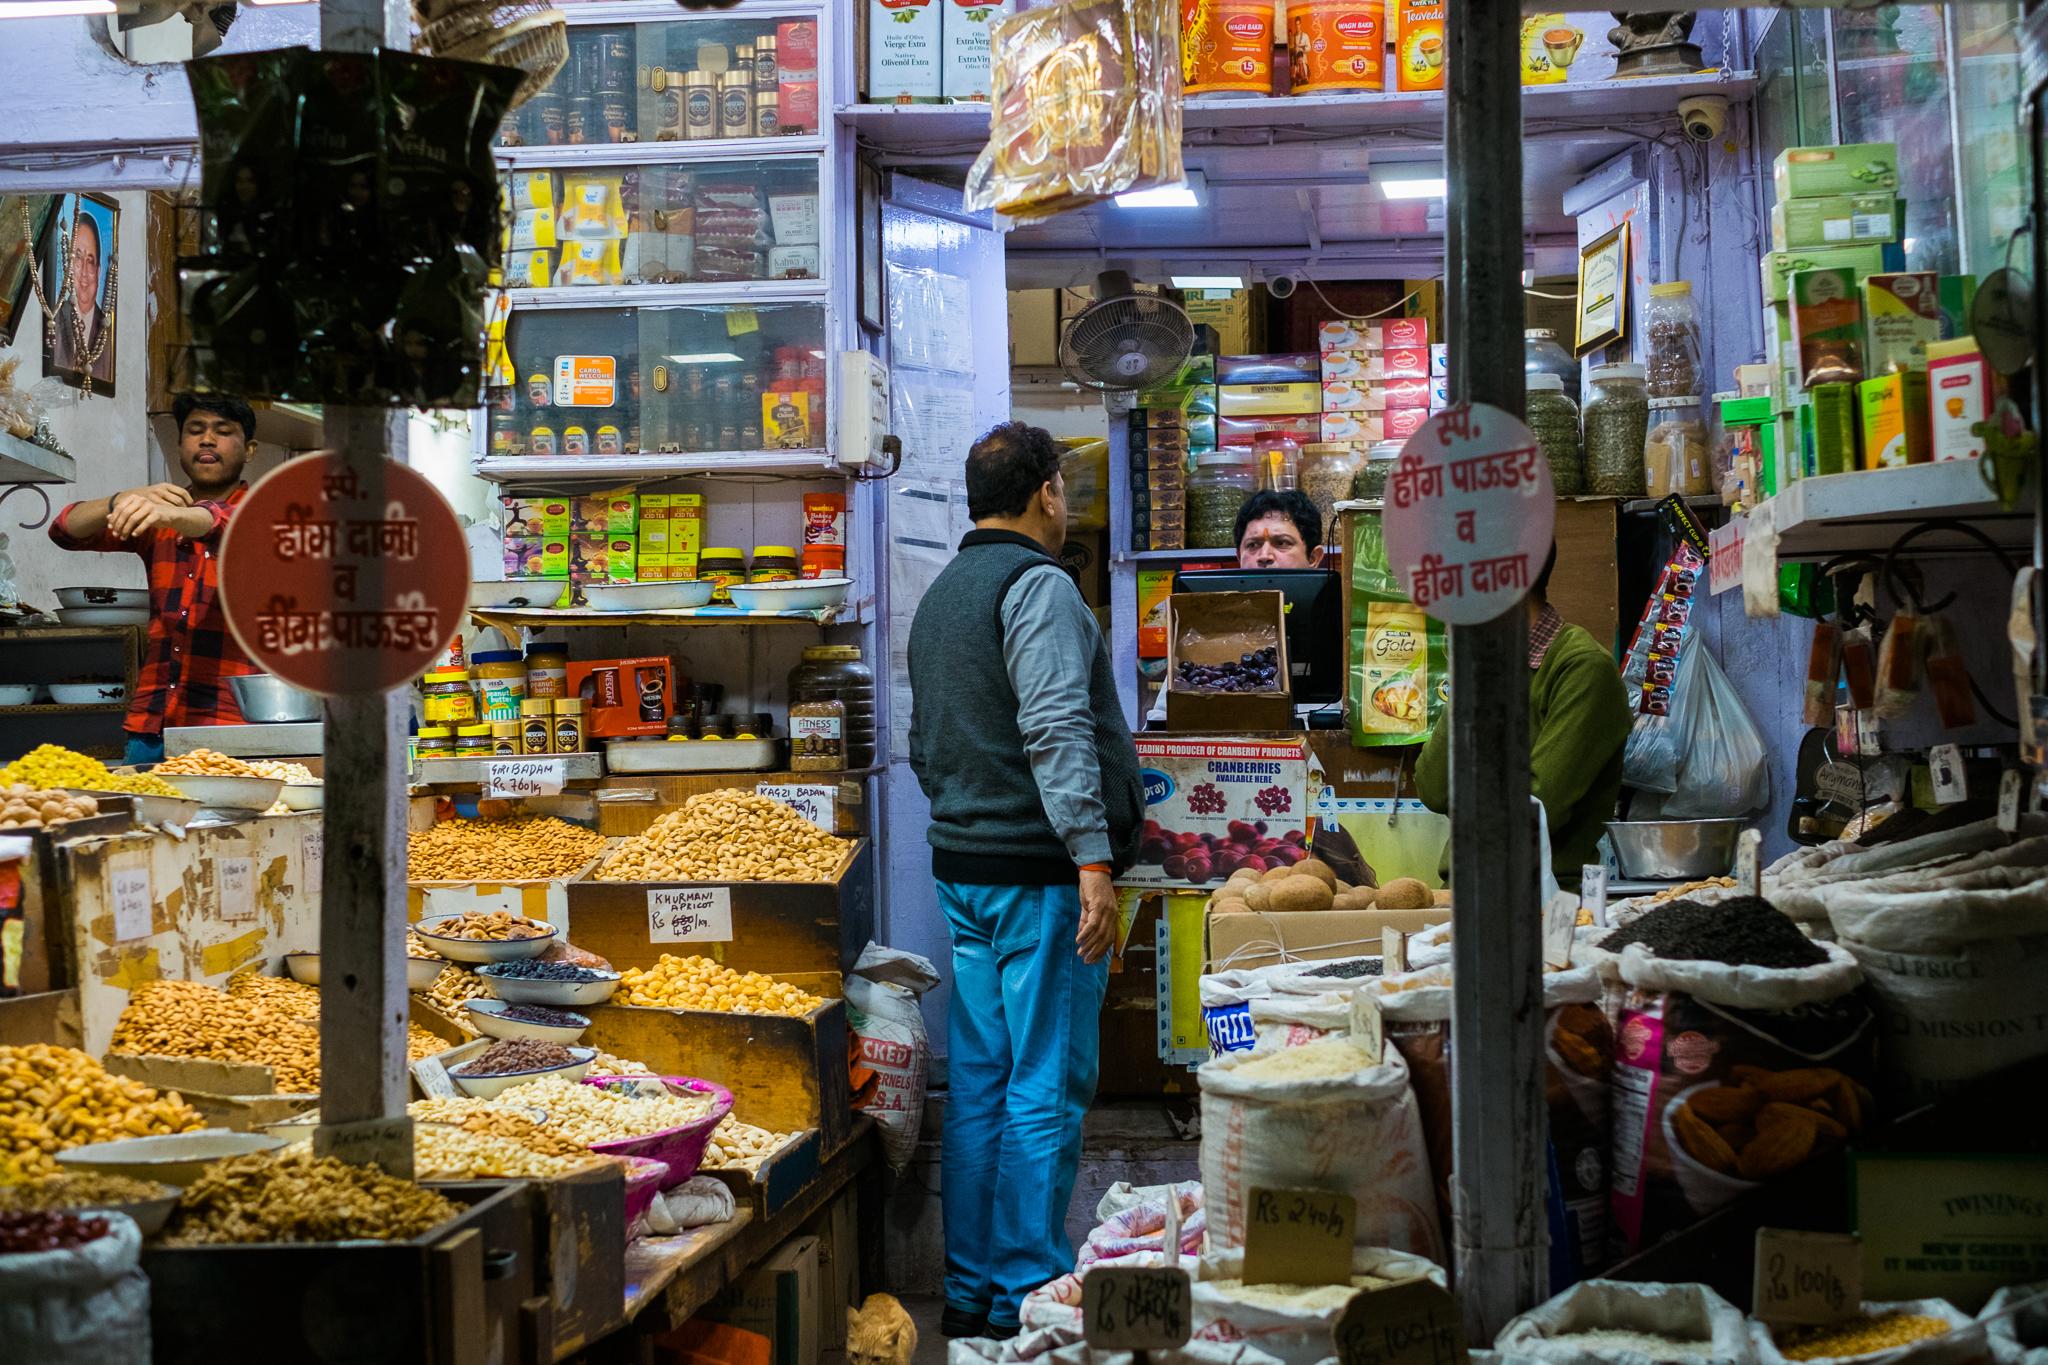 Delhi India Travel Street Photography (41 of 47).jpg